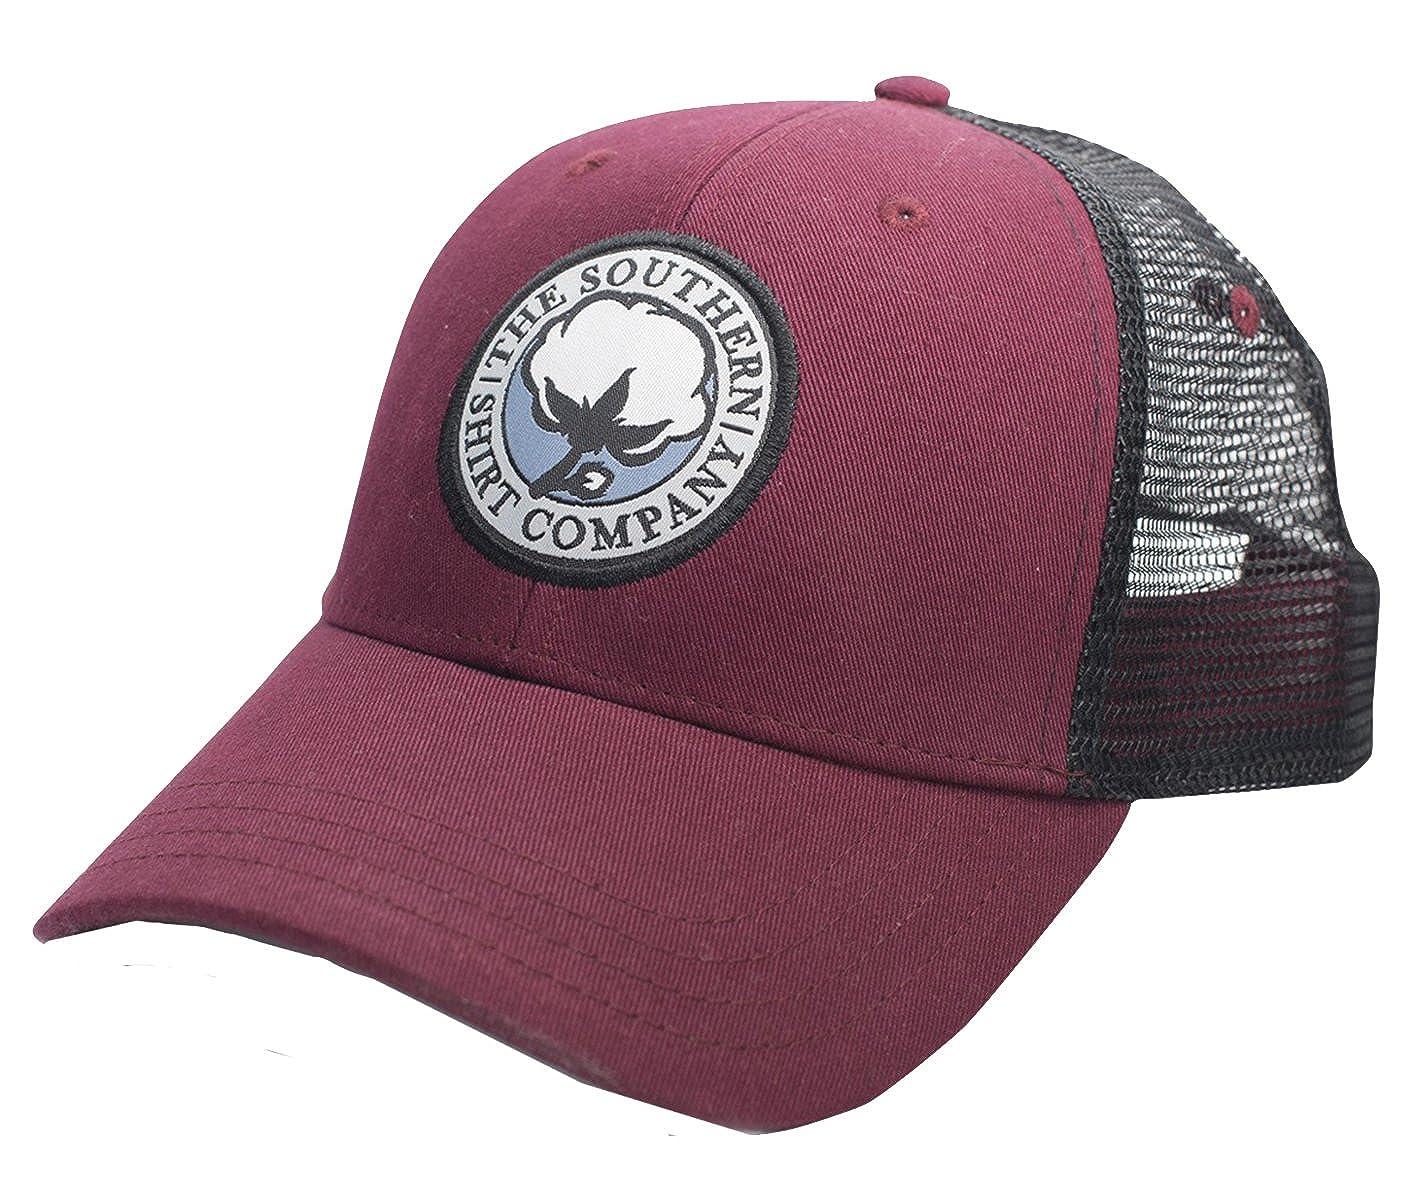 Southern Shirt Mesh Back Trucker Hat